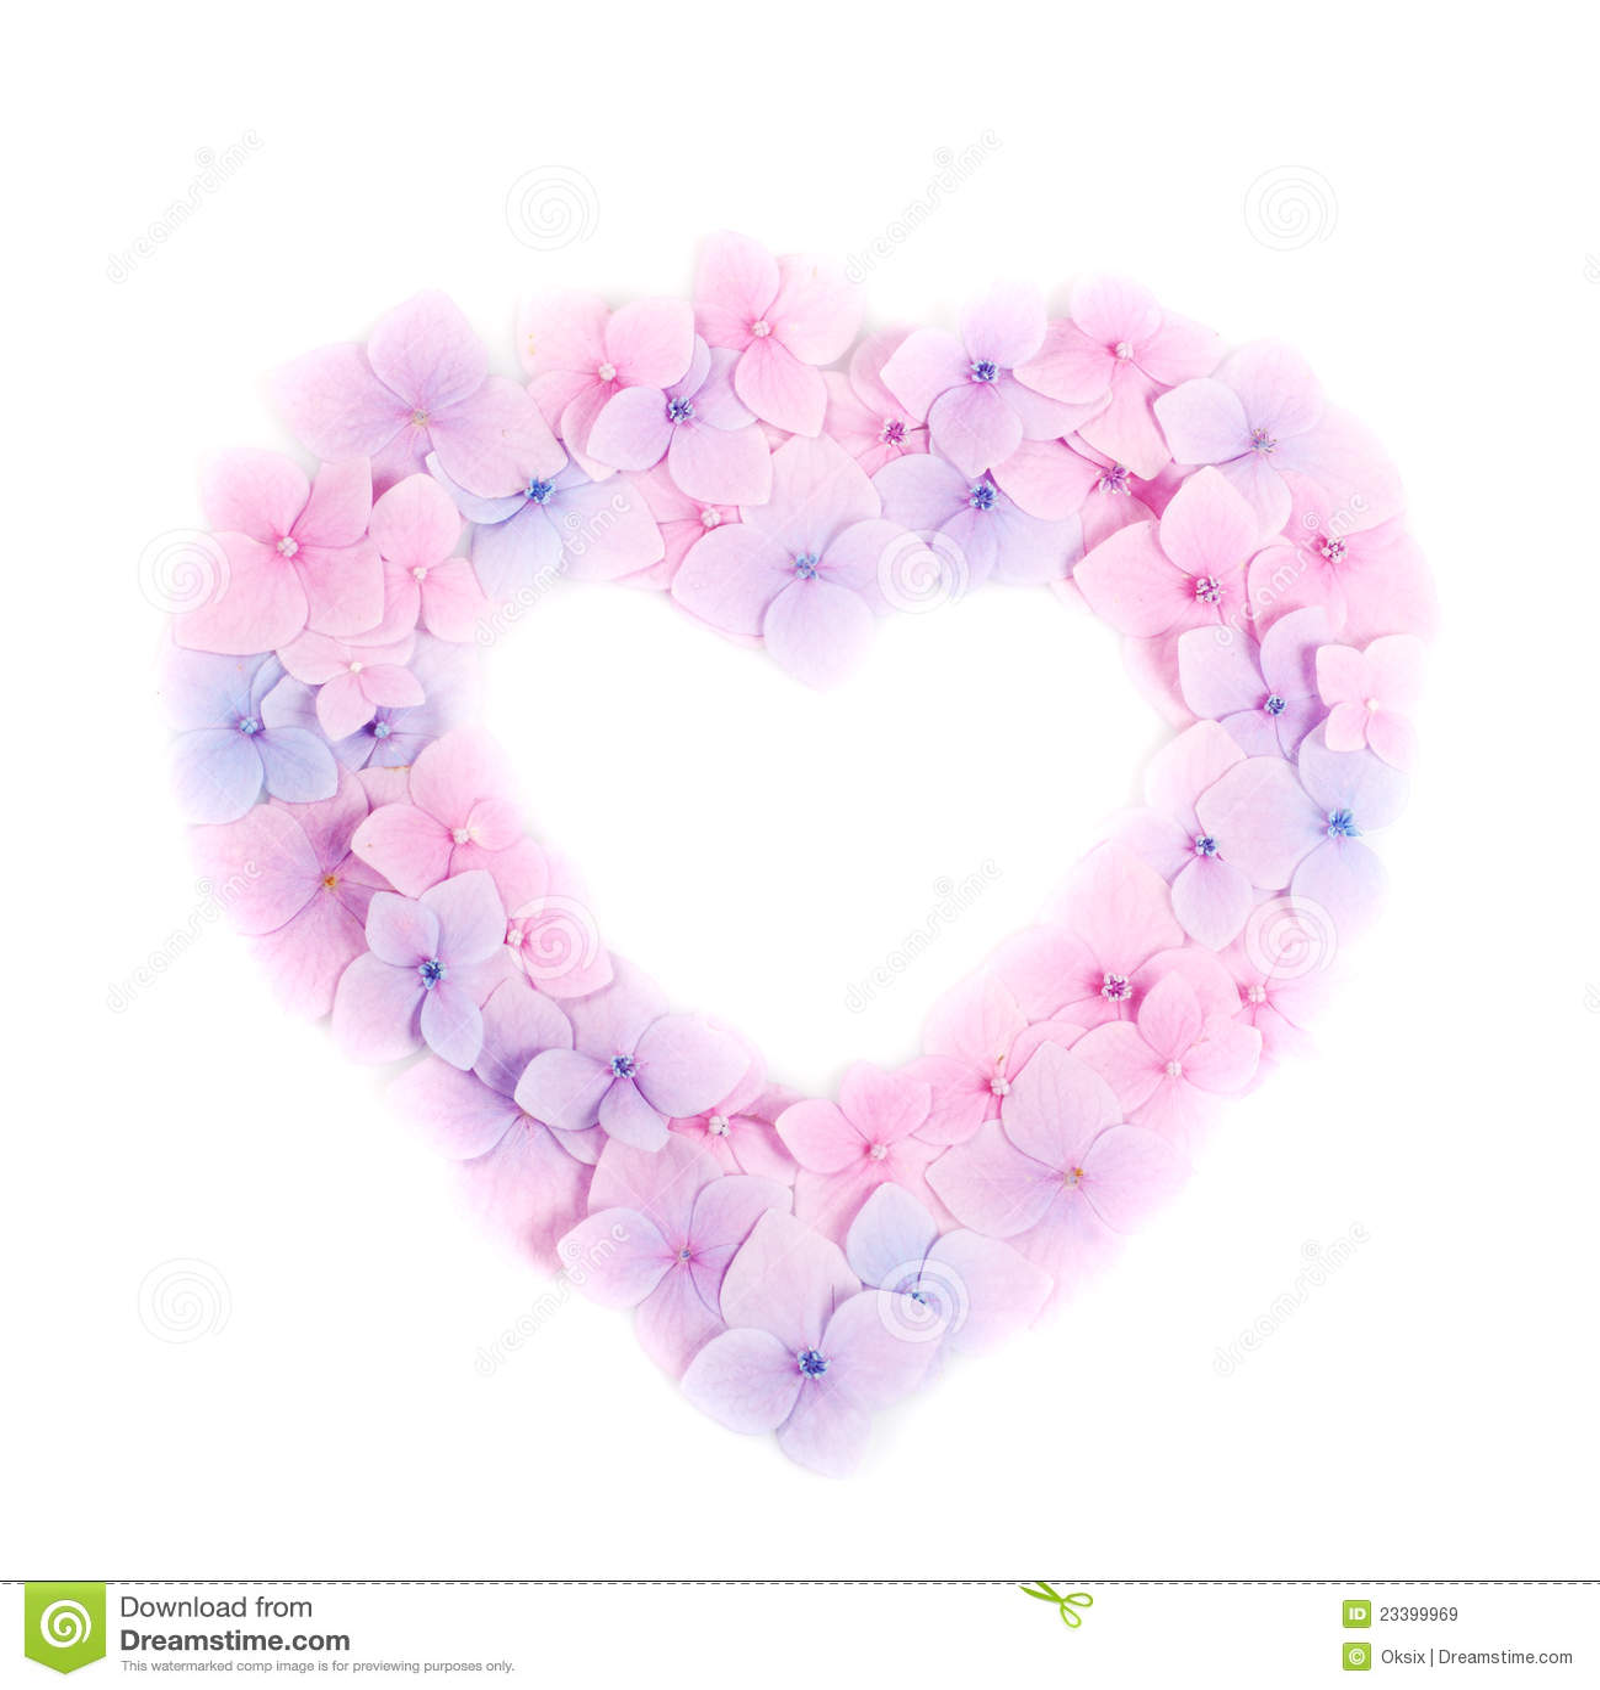 Pink flower heart stock image image of floral beauty 23399969 pink flower heart mightylinksfo